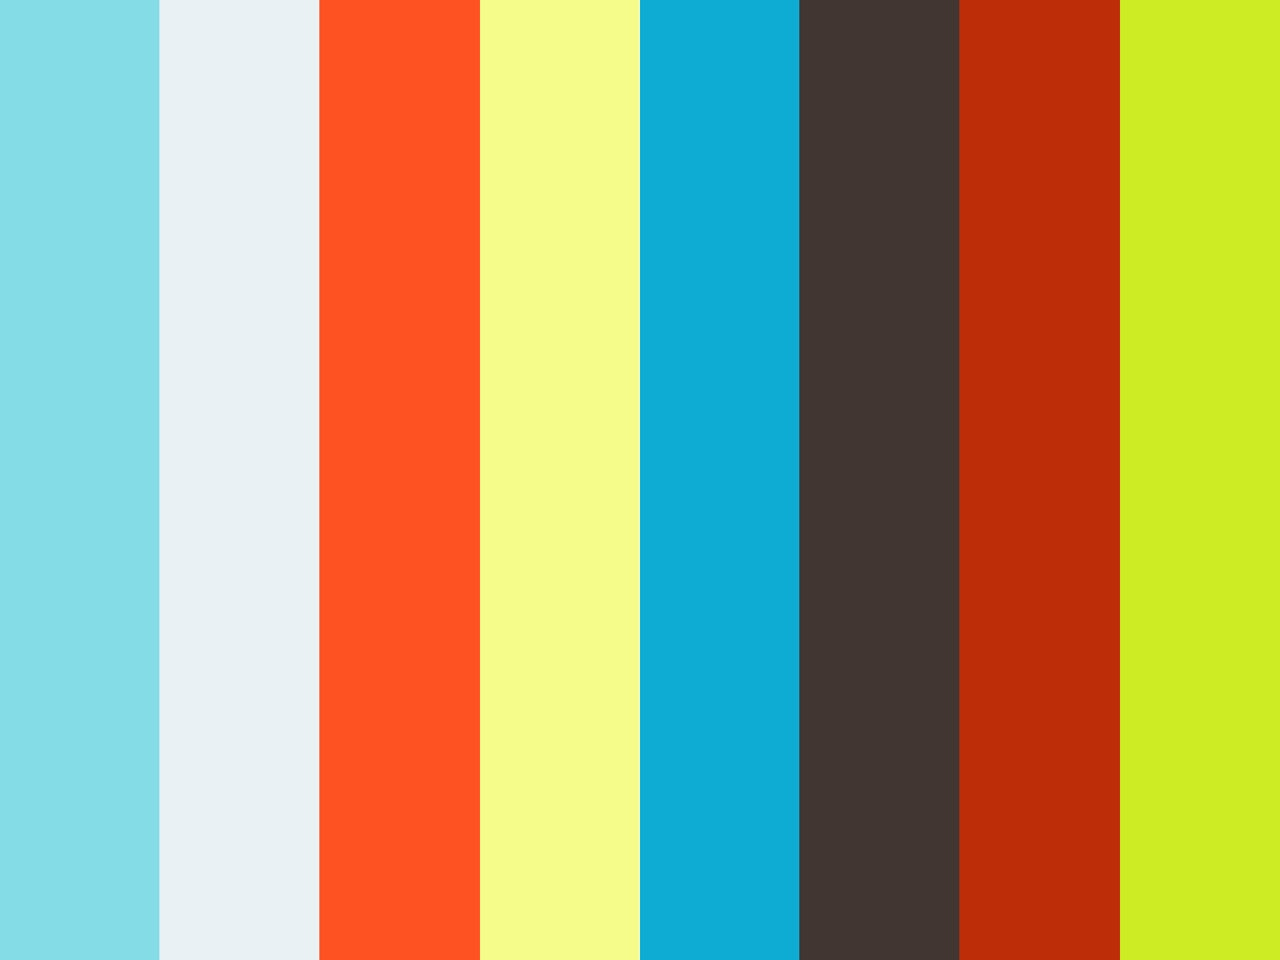 62036JMP: Categorical Variables